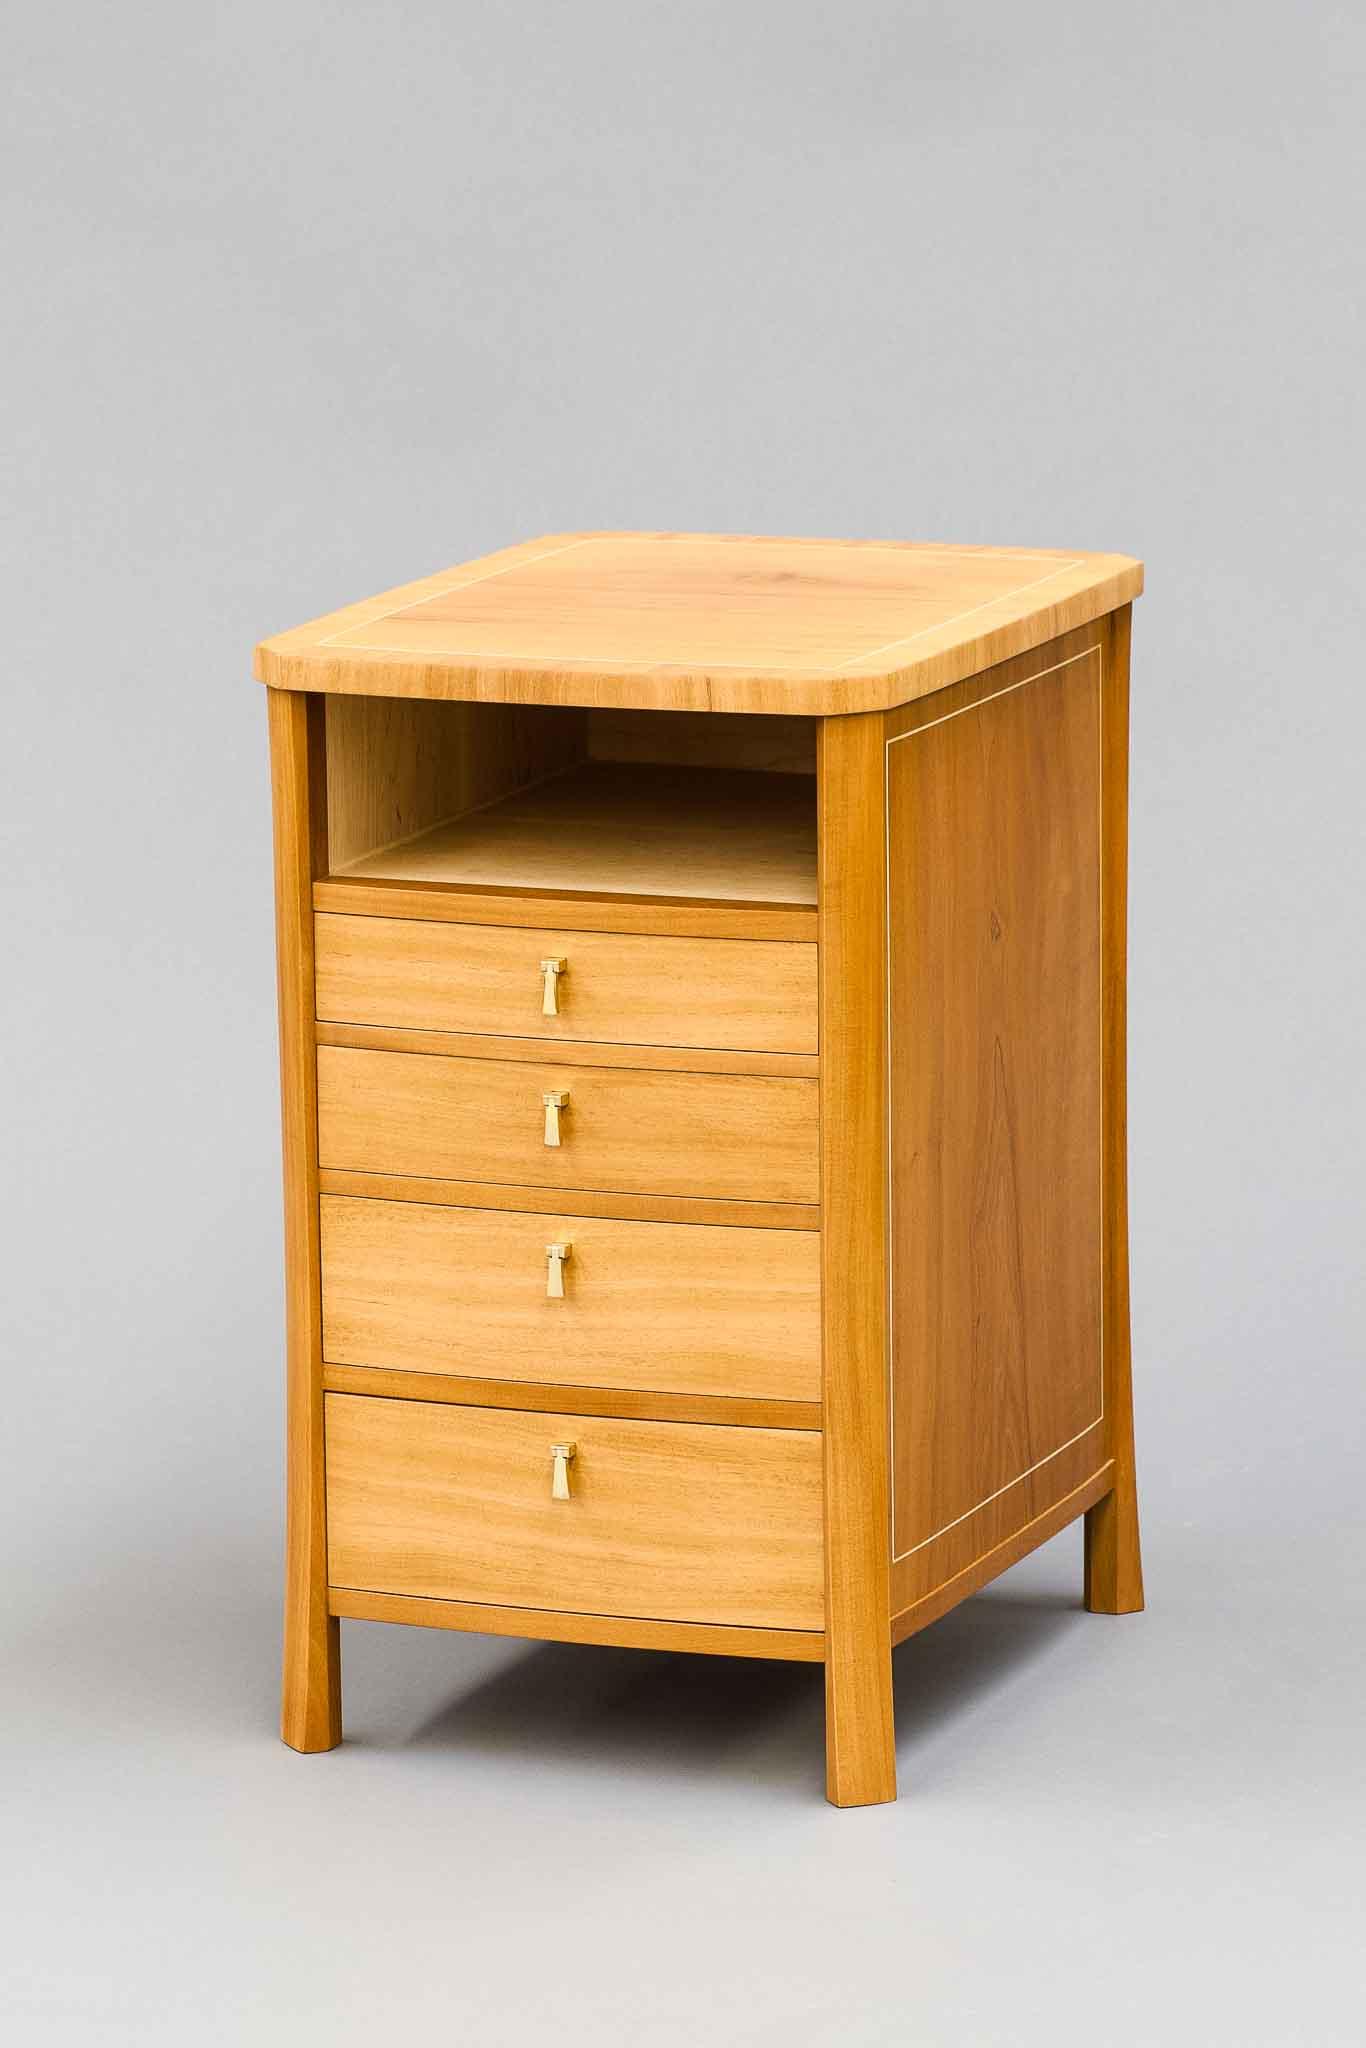 Book Cabinet 171 The Krenov School Of Fine Furniture